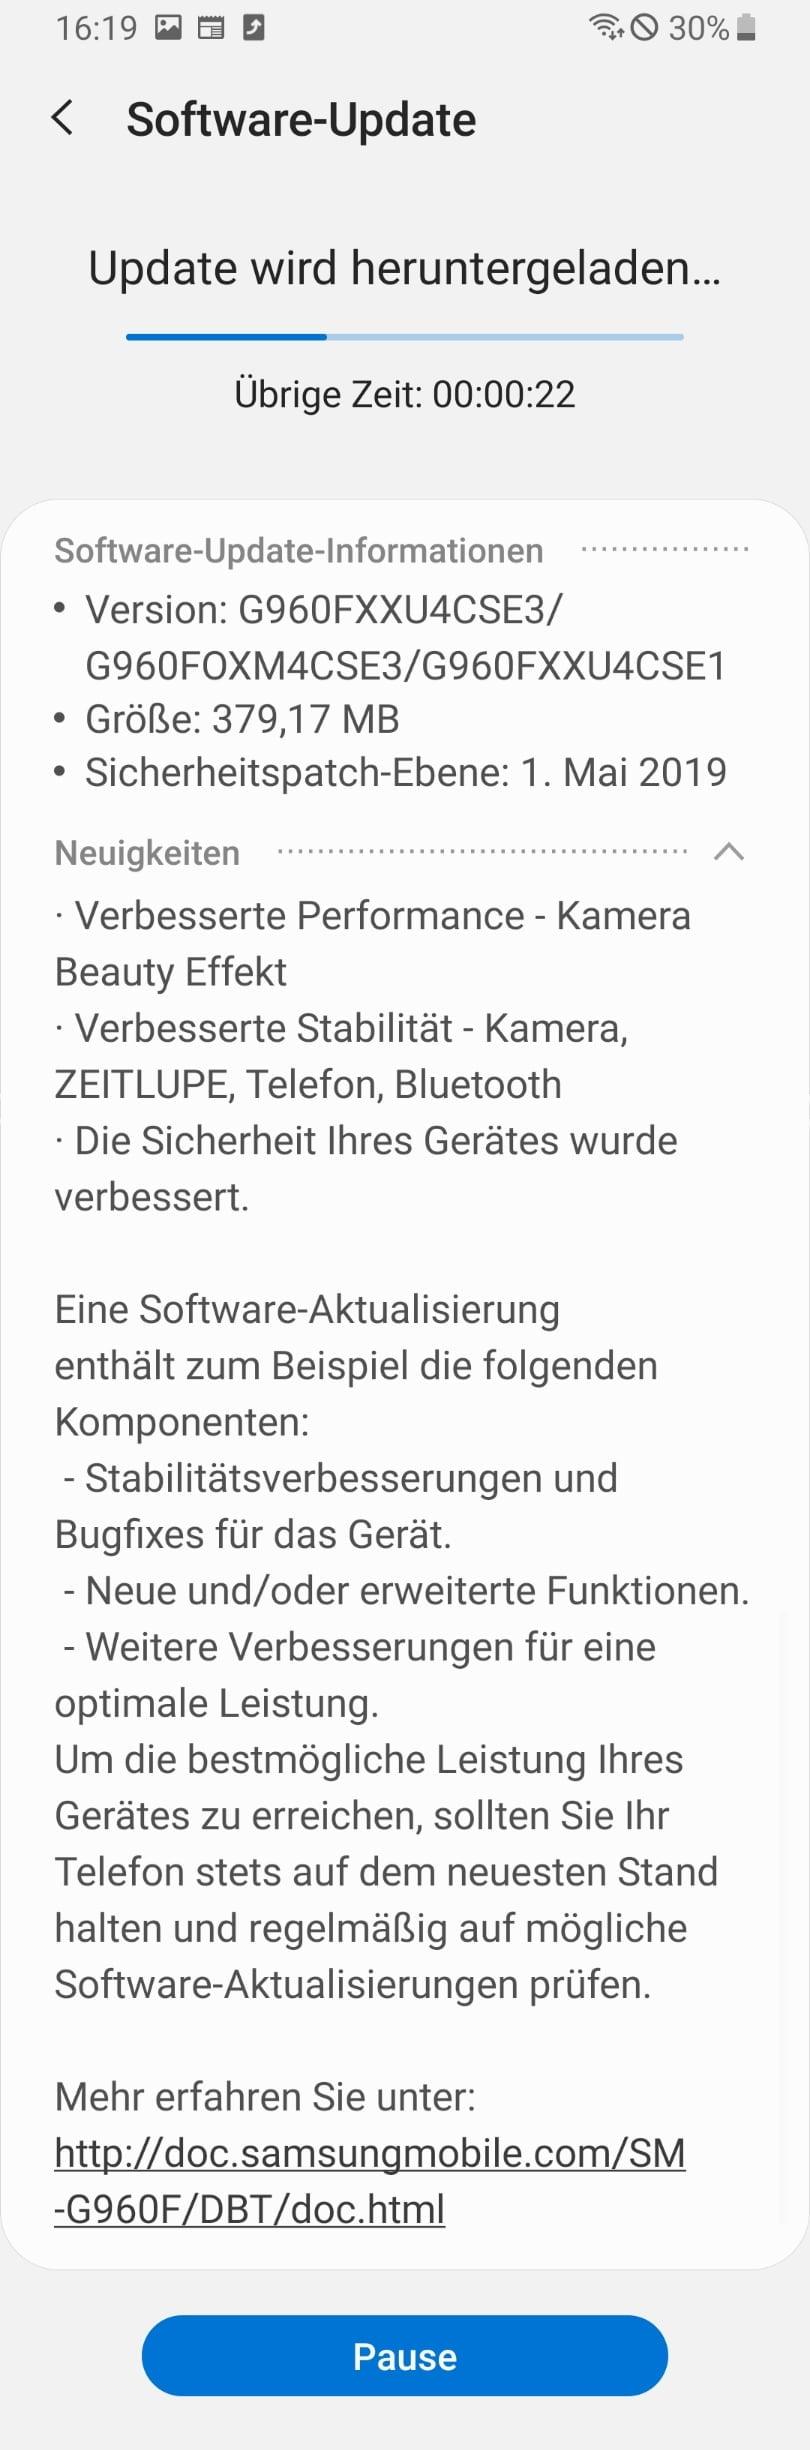 Galaxy S9 Update: Samsung bessert bei der Kamera nach techboys.de • smarte News, auf den Punkt!